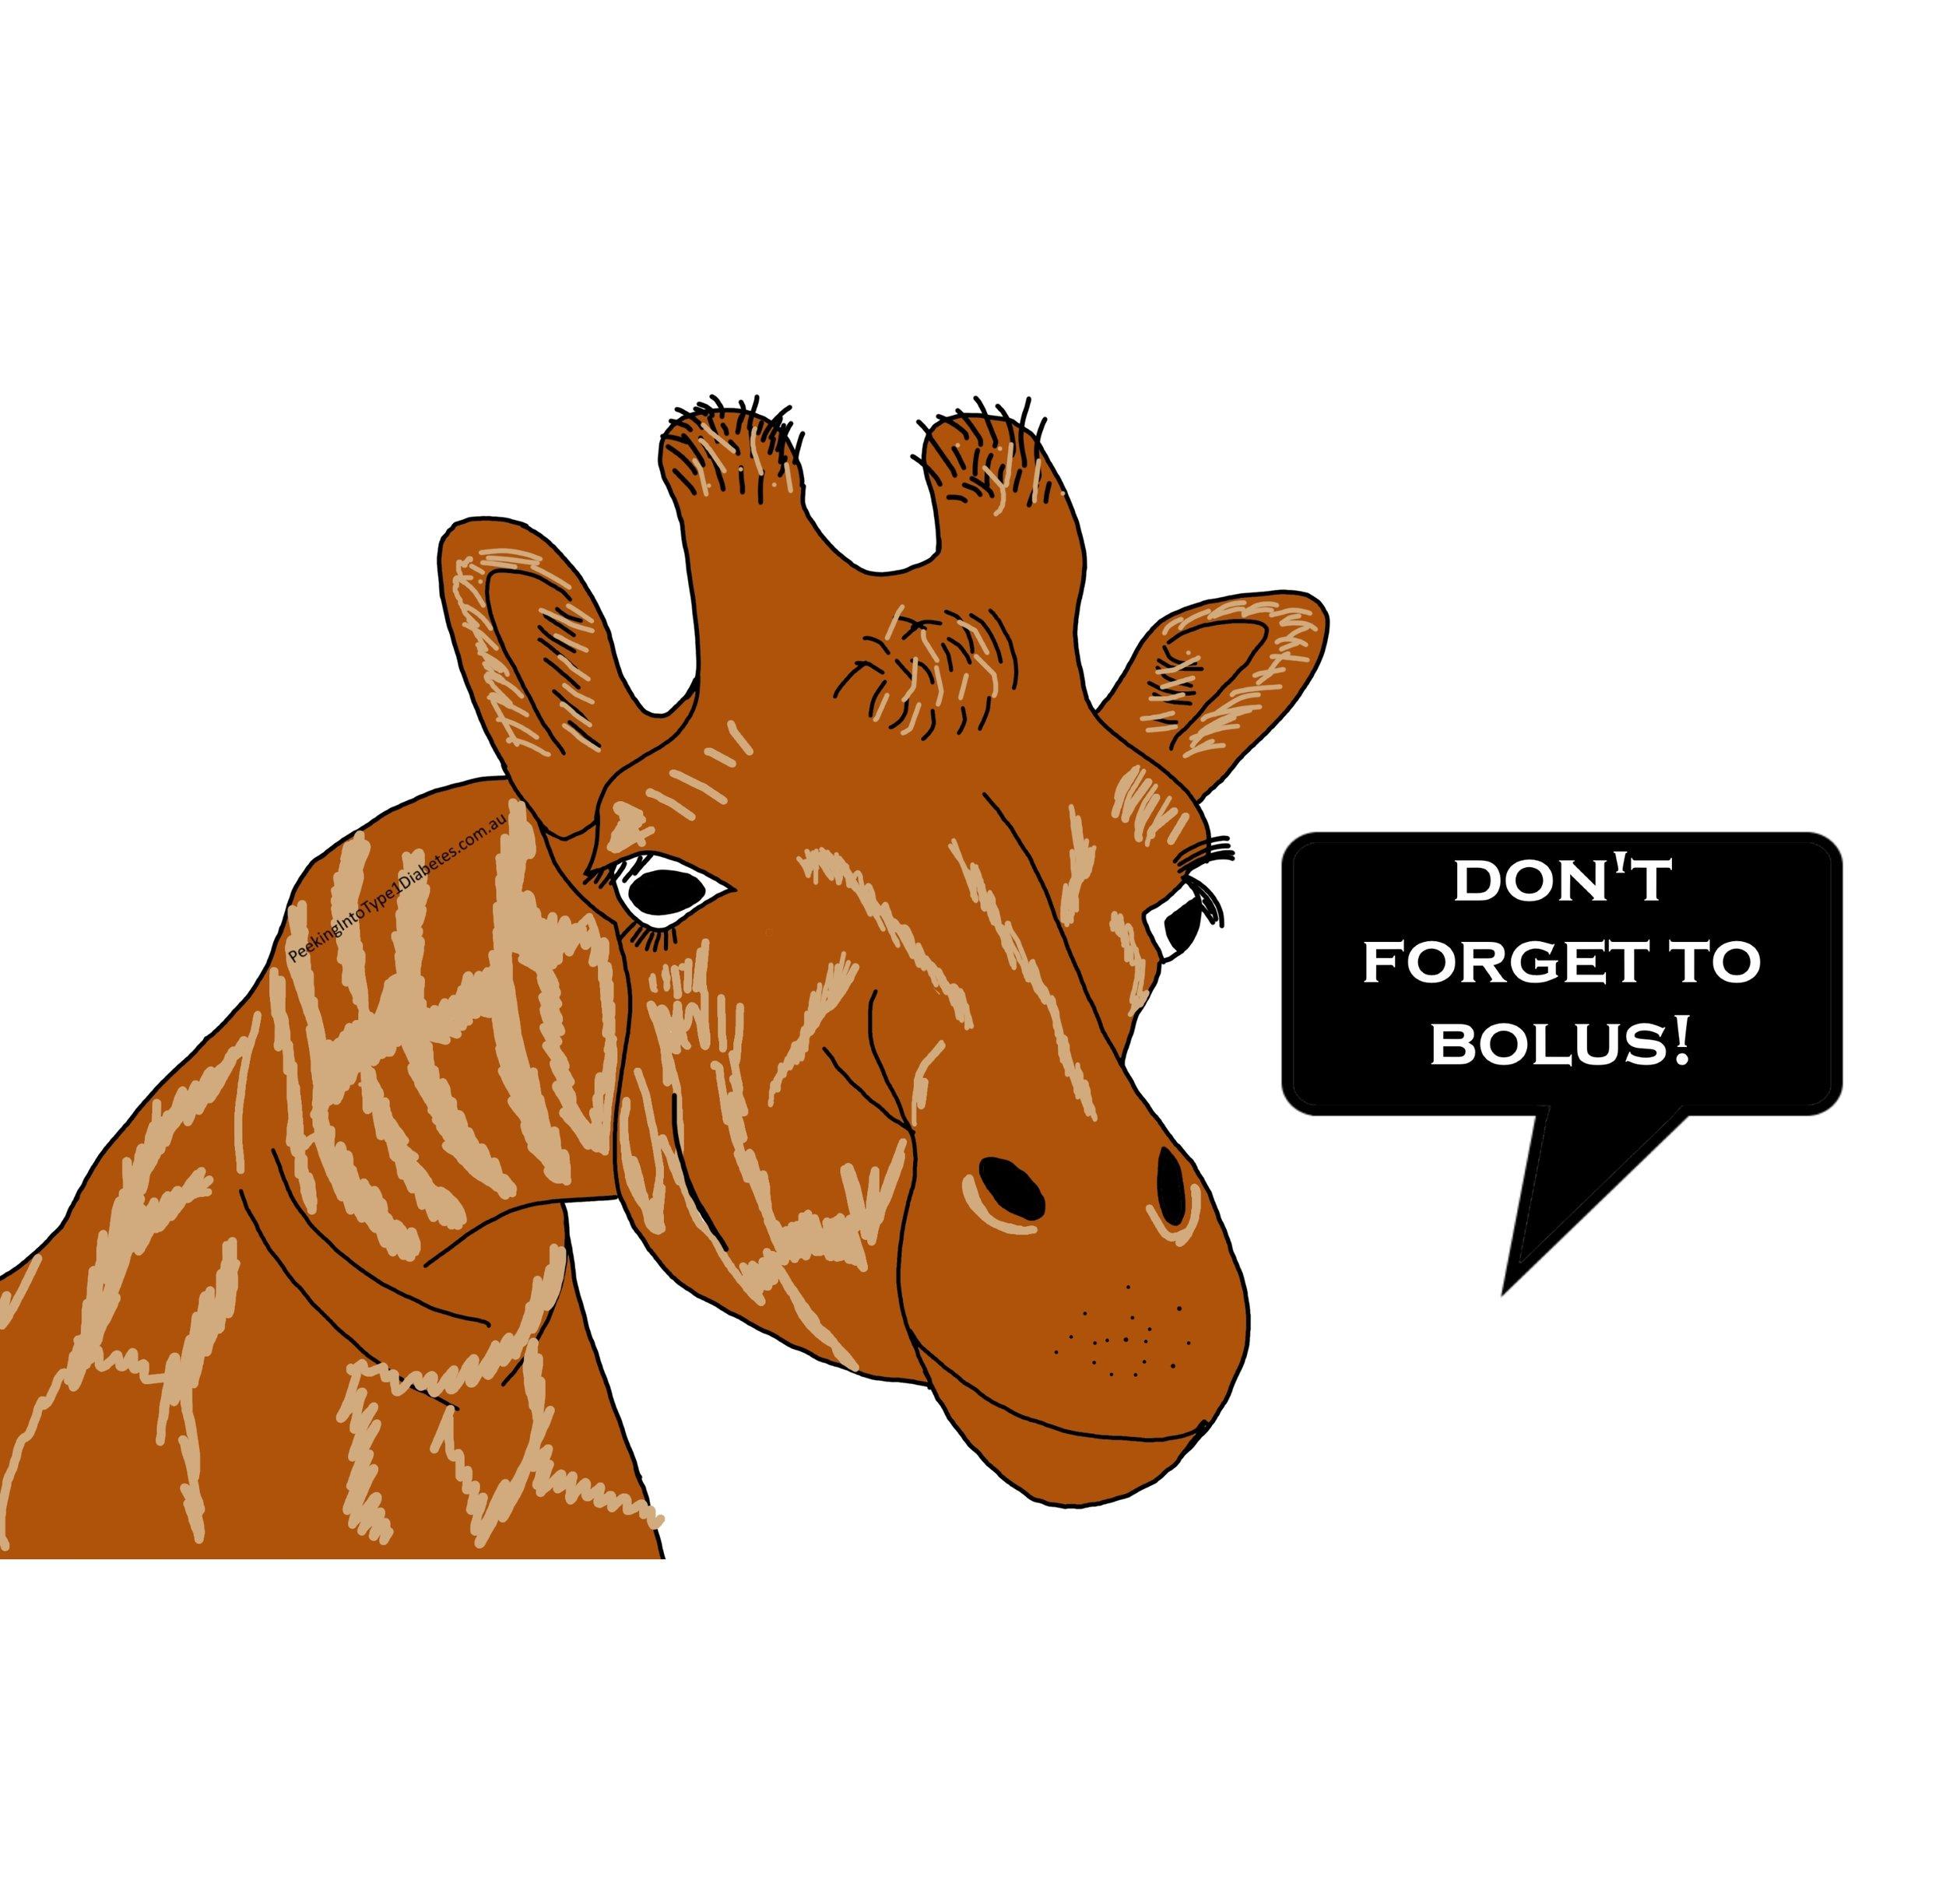 giraffe dont forget to bolus.jpg